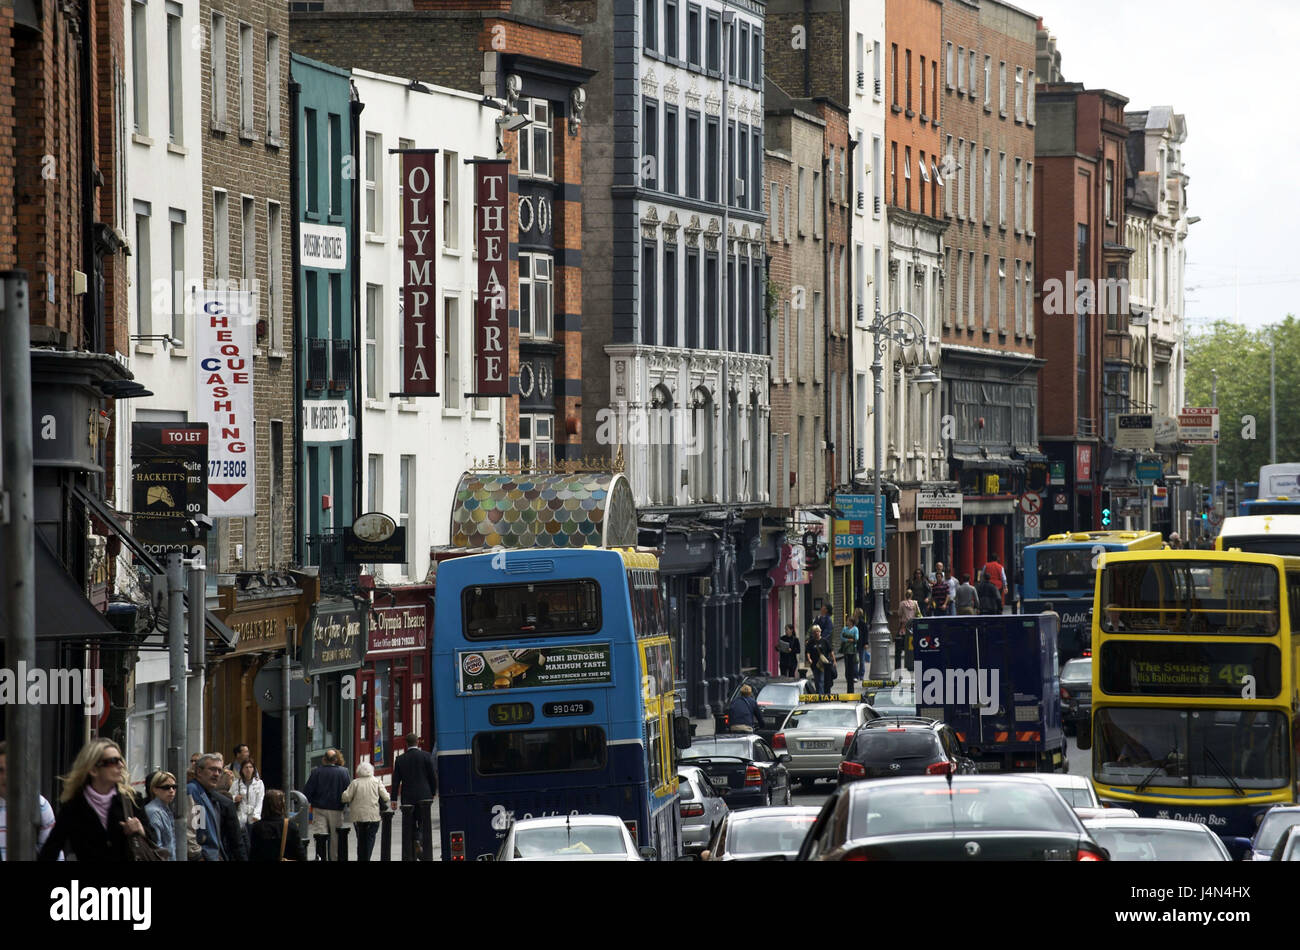 Ireland, Leinster, Dublin, lady Street, - Stock Image